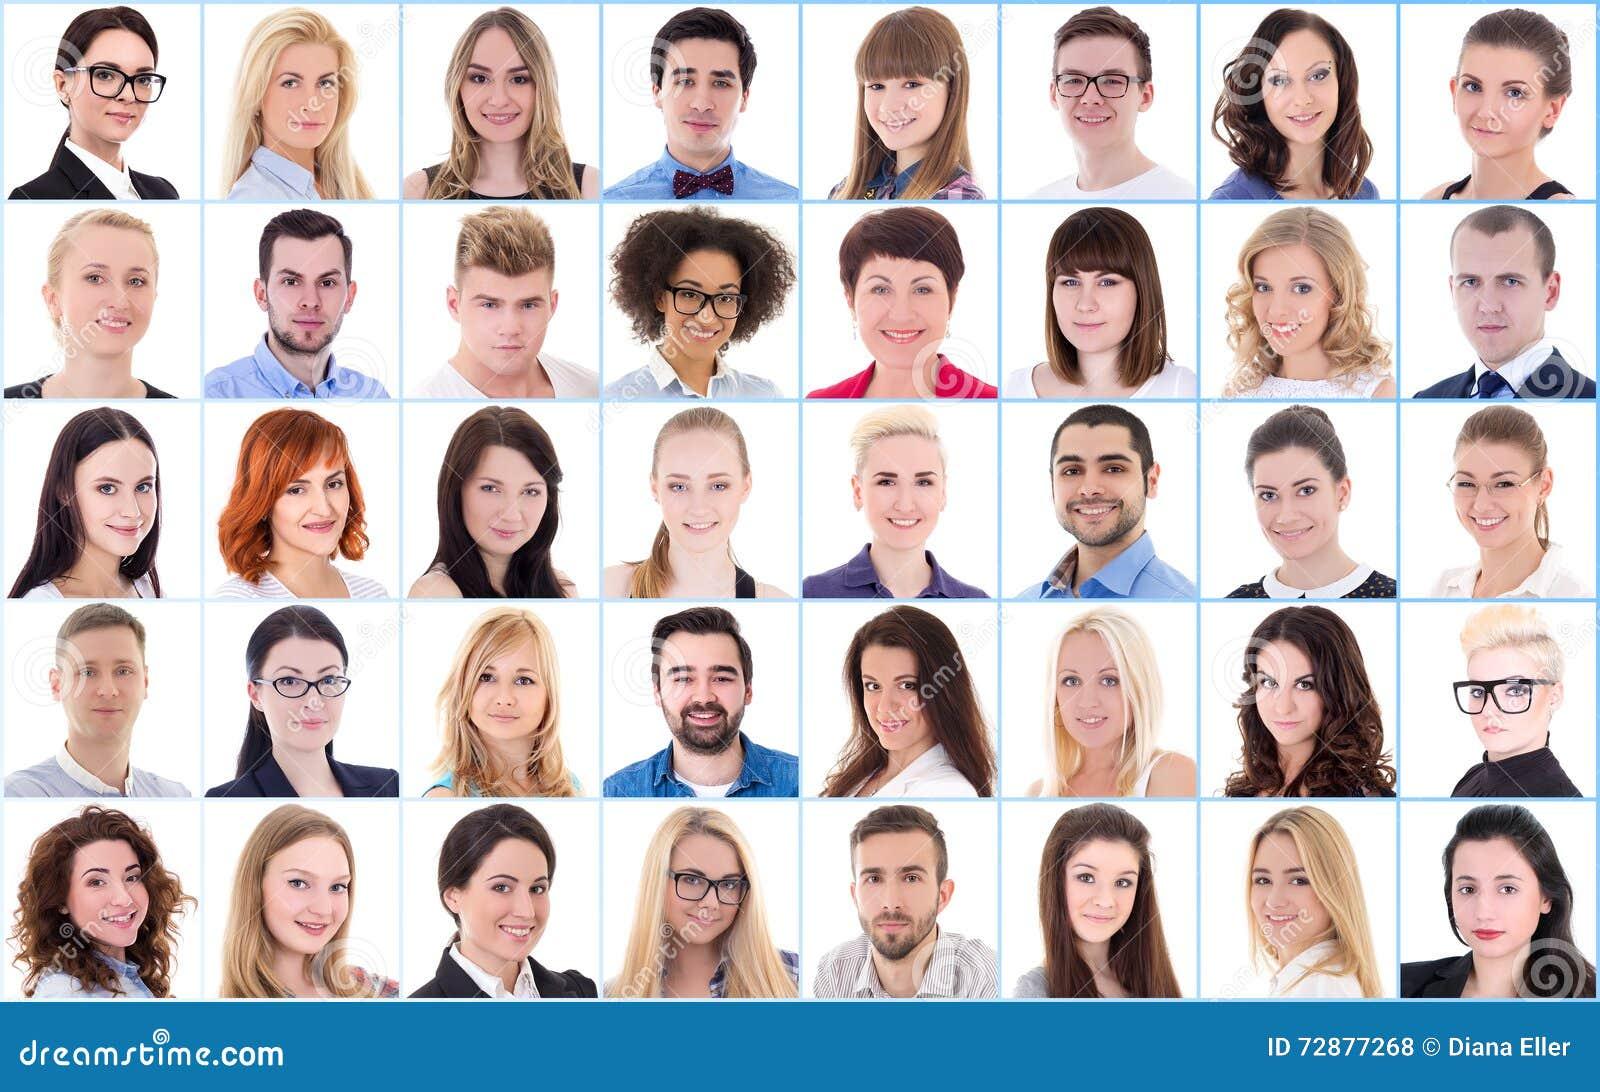 Diversiteitsconcept - collage met vele bedrijfsmensenportretten